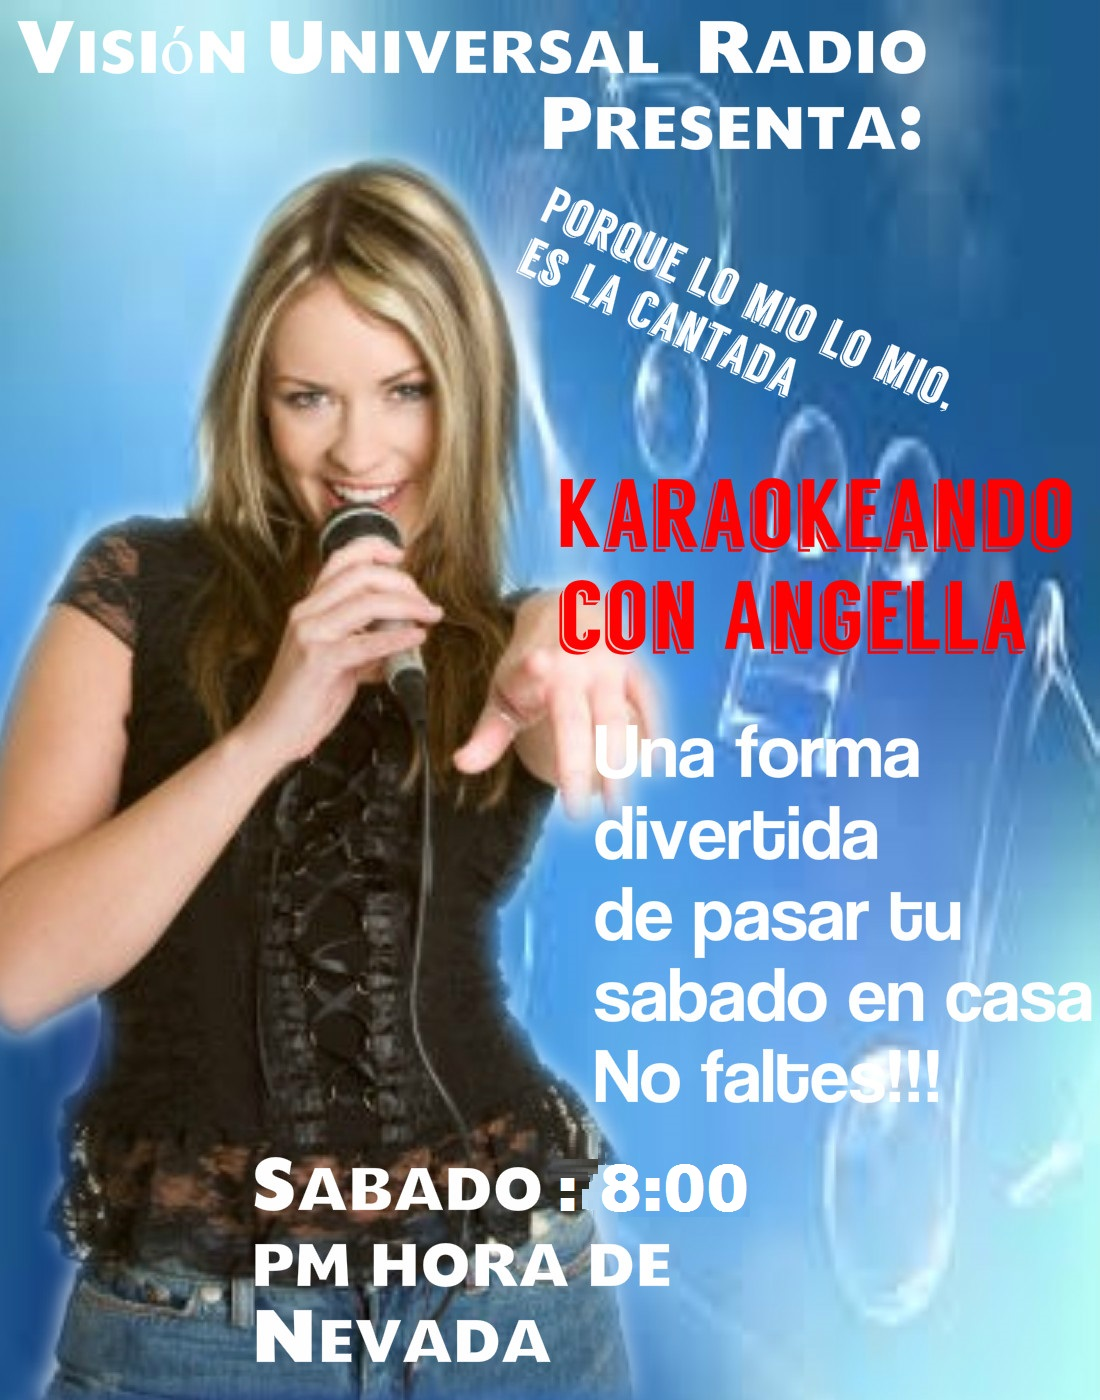 Karaokeando